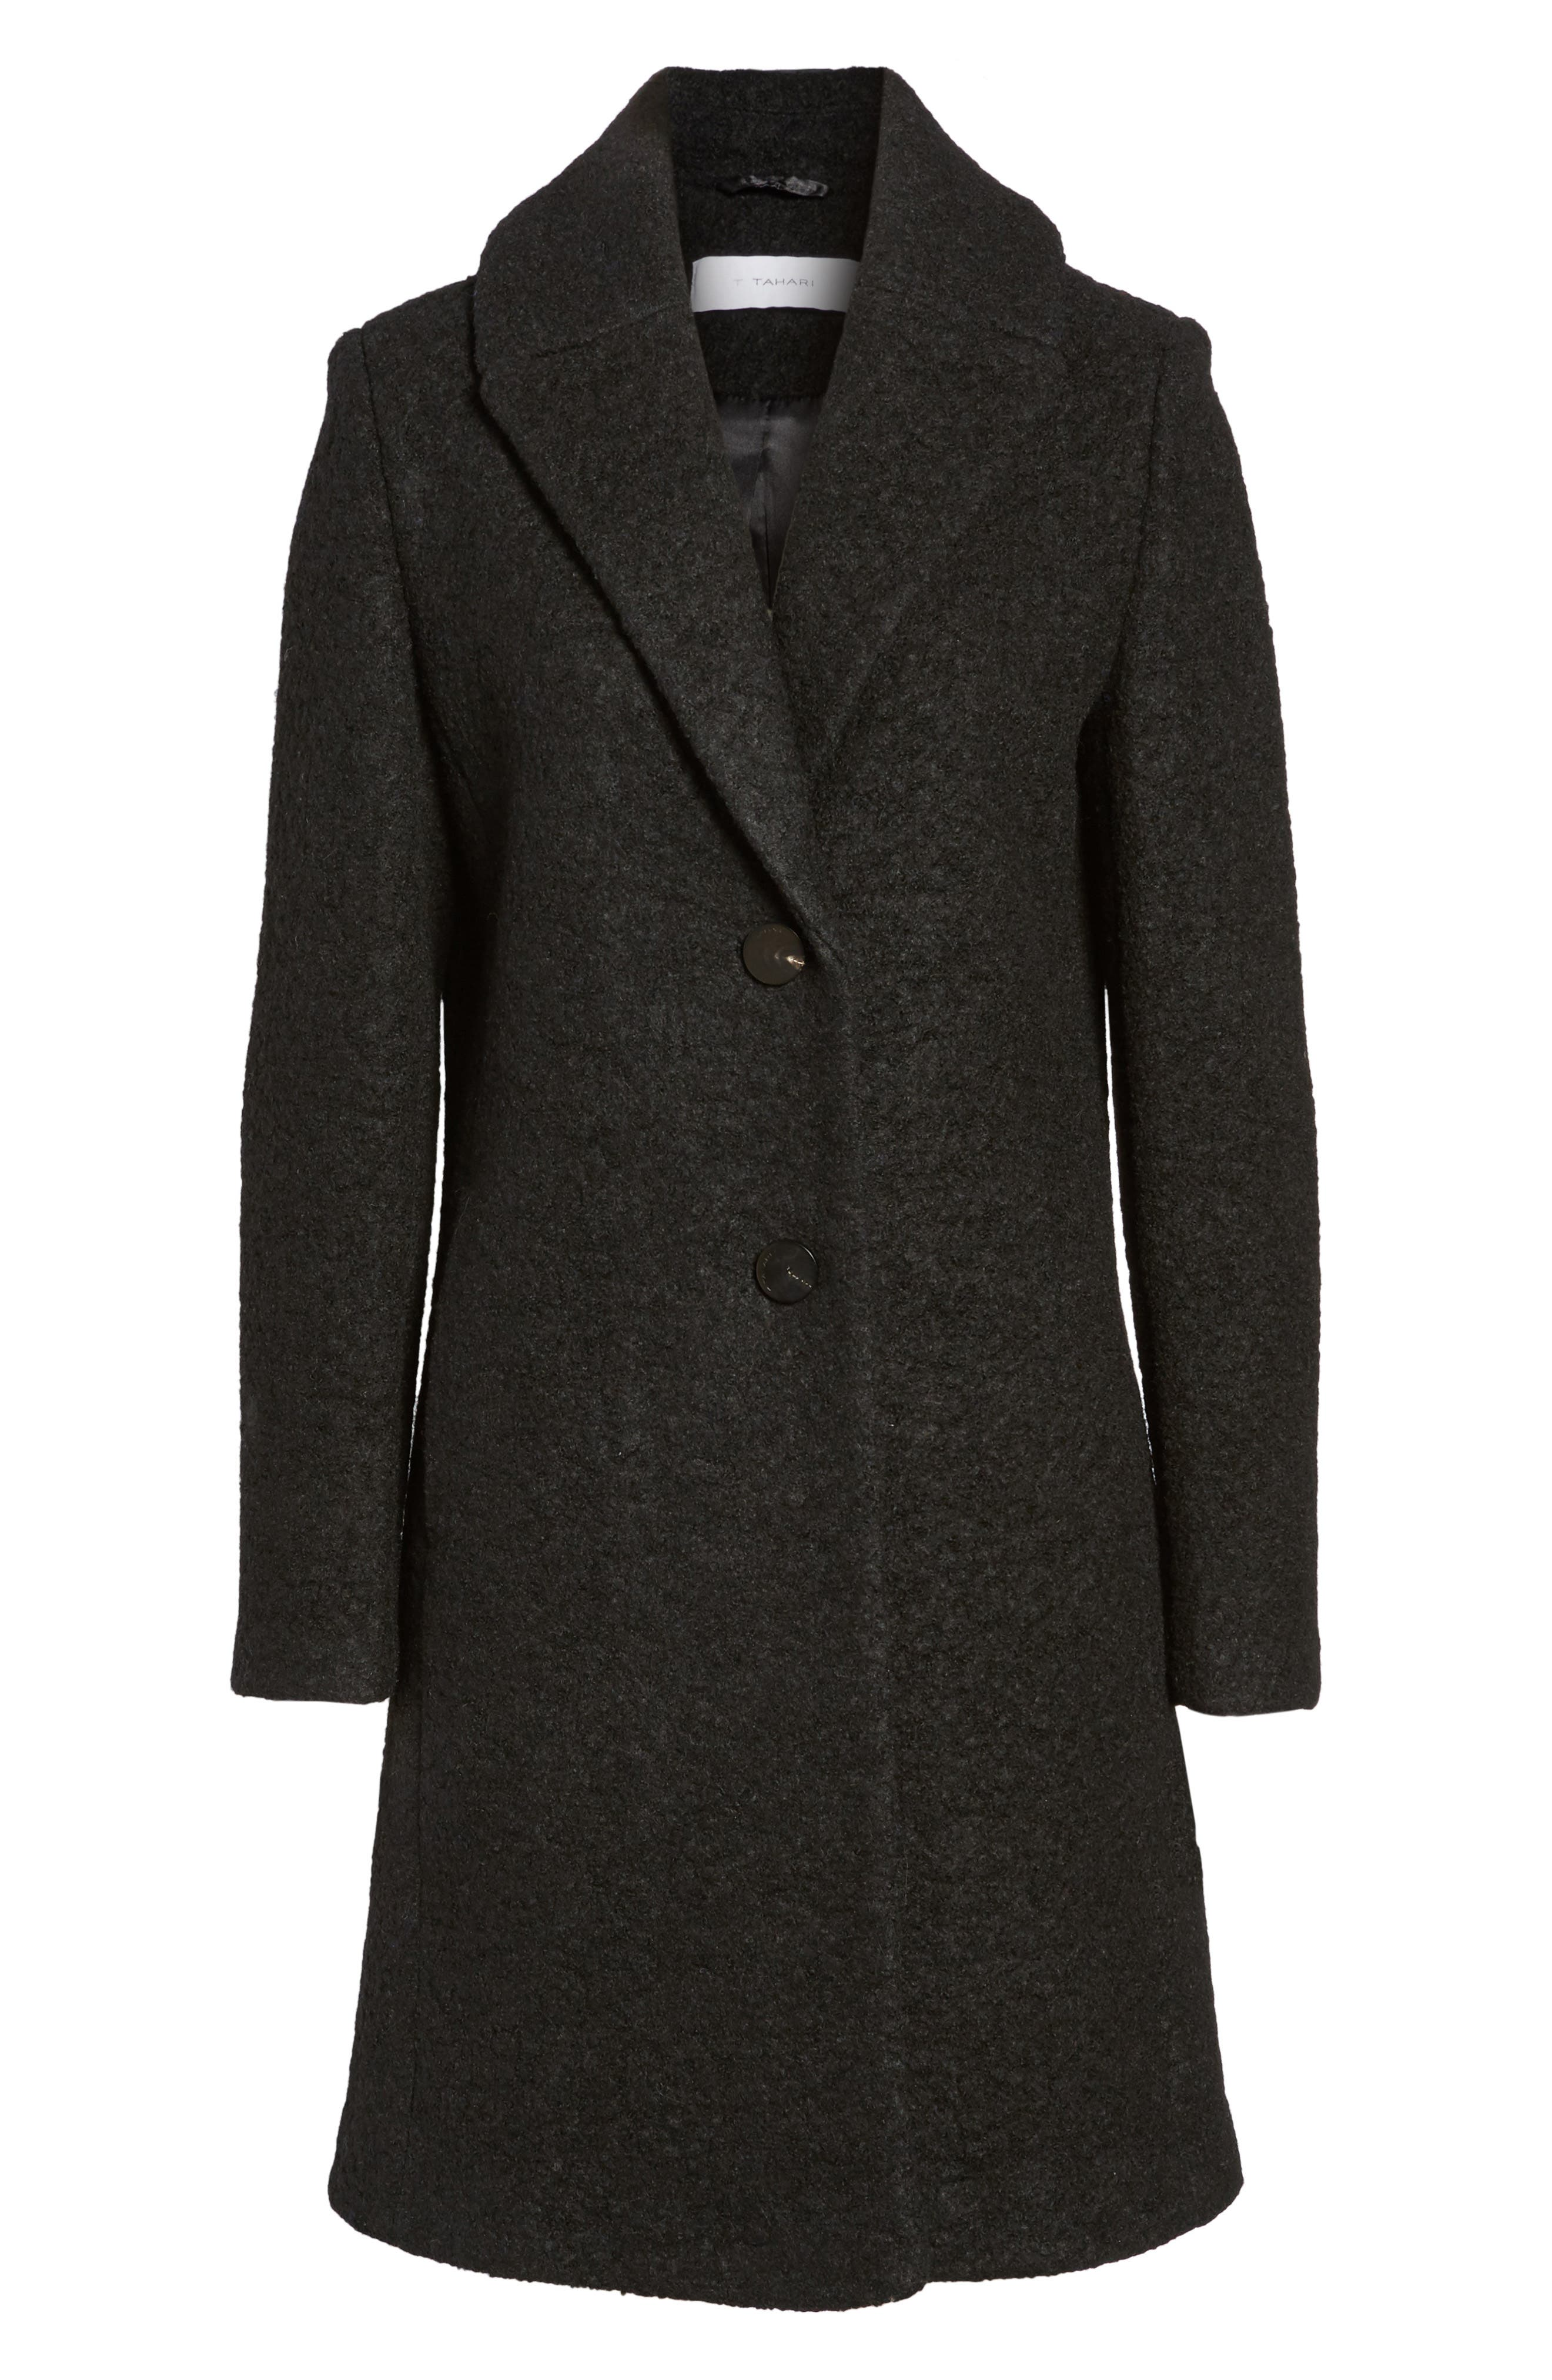 'Tessa' Boiled Wool Blend Coat,                             Alternate thumbnail 5, color,                             001